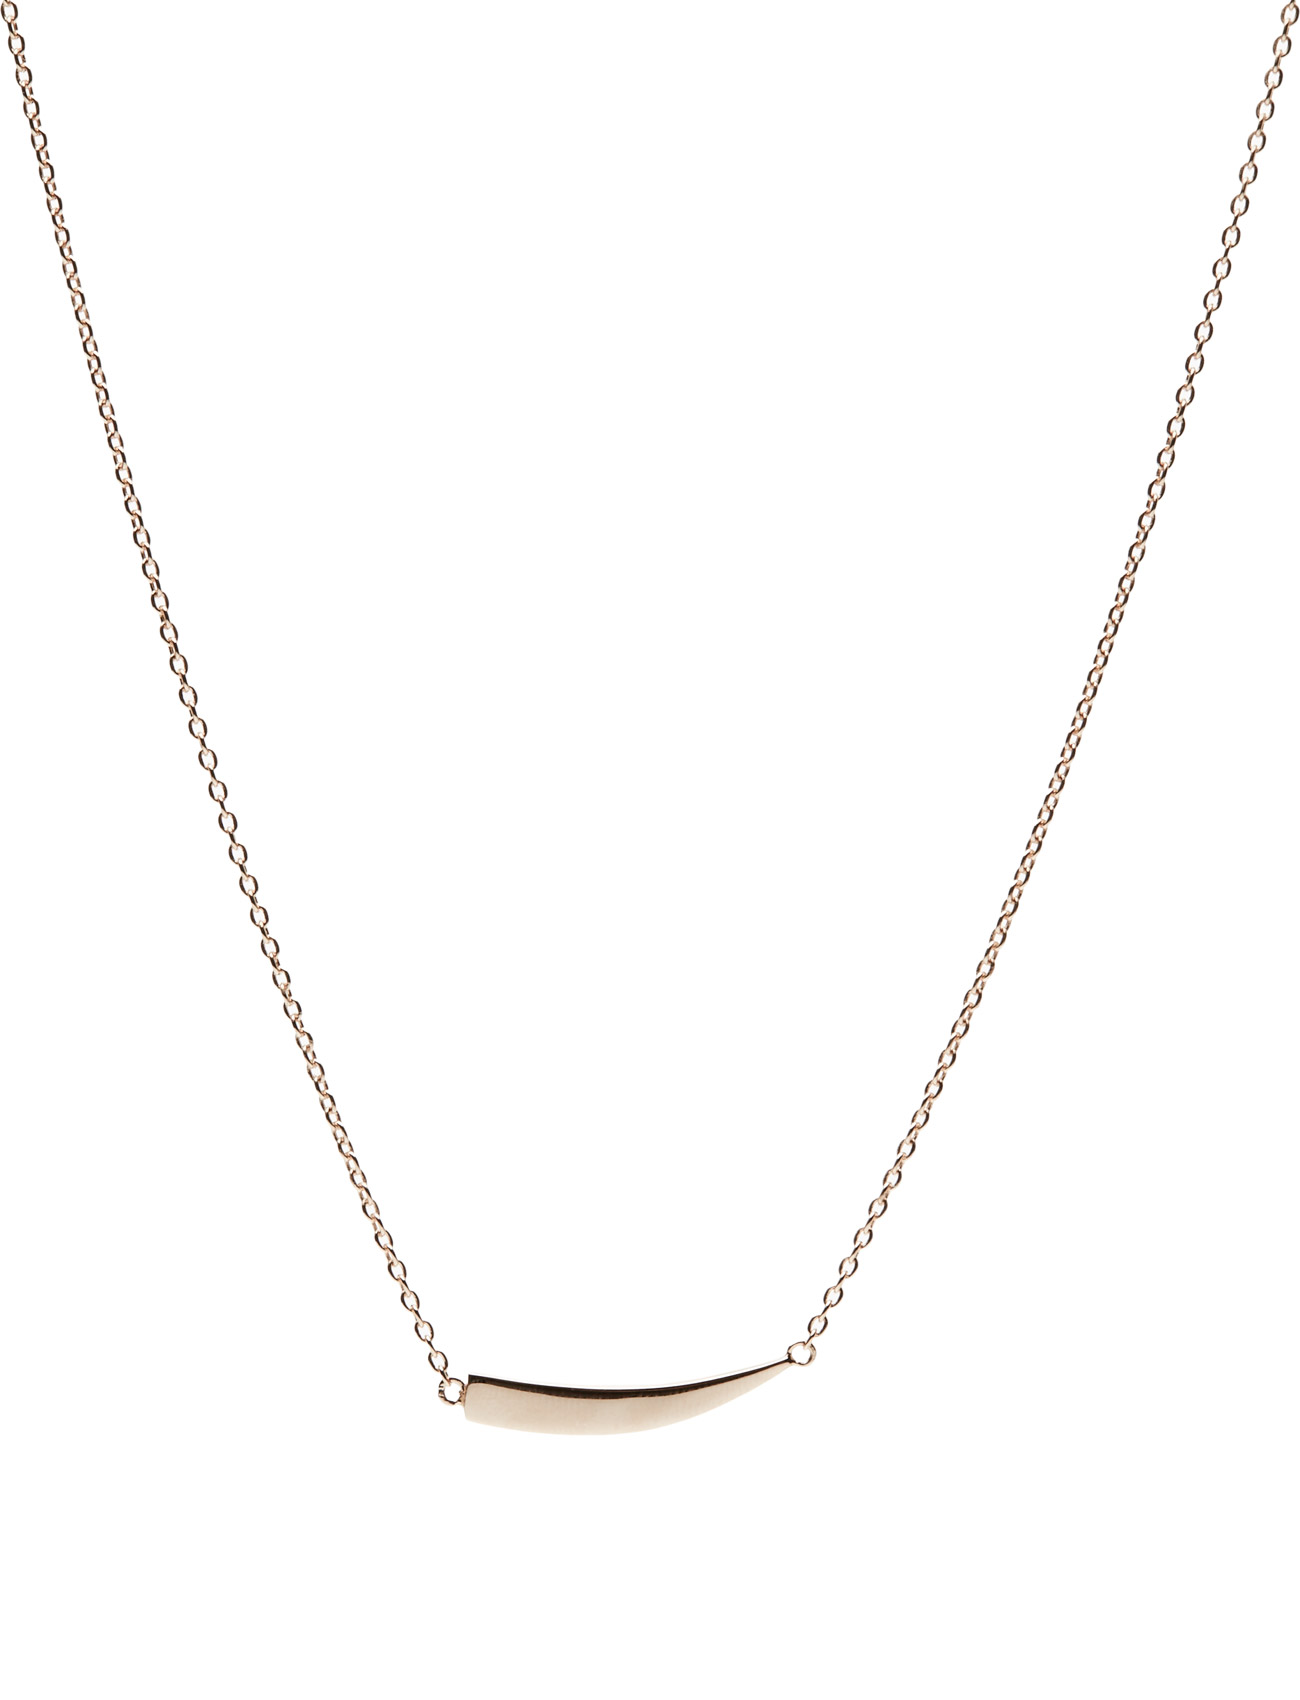 De tuffaste Pila Pianura Necklace Sif Jakobs Jewellery Smycken till ... c688fda2bd56d